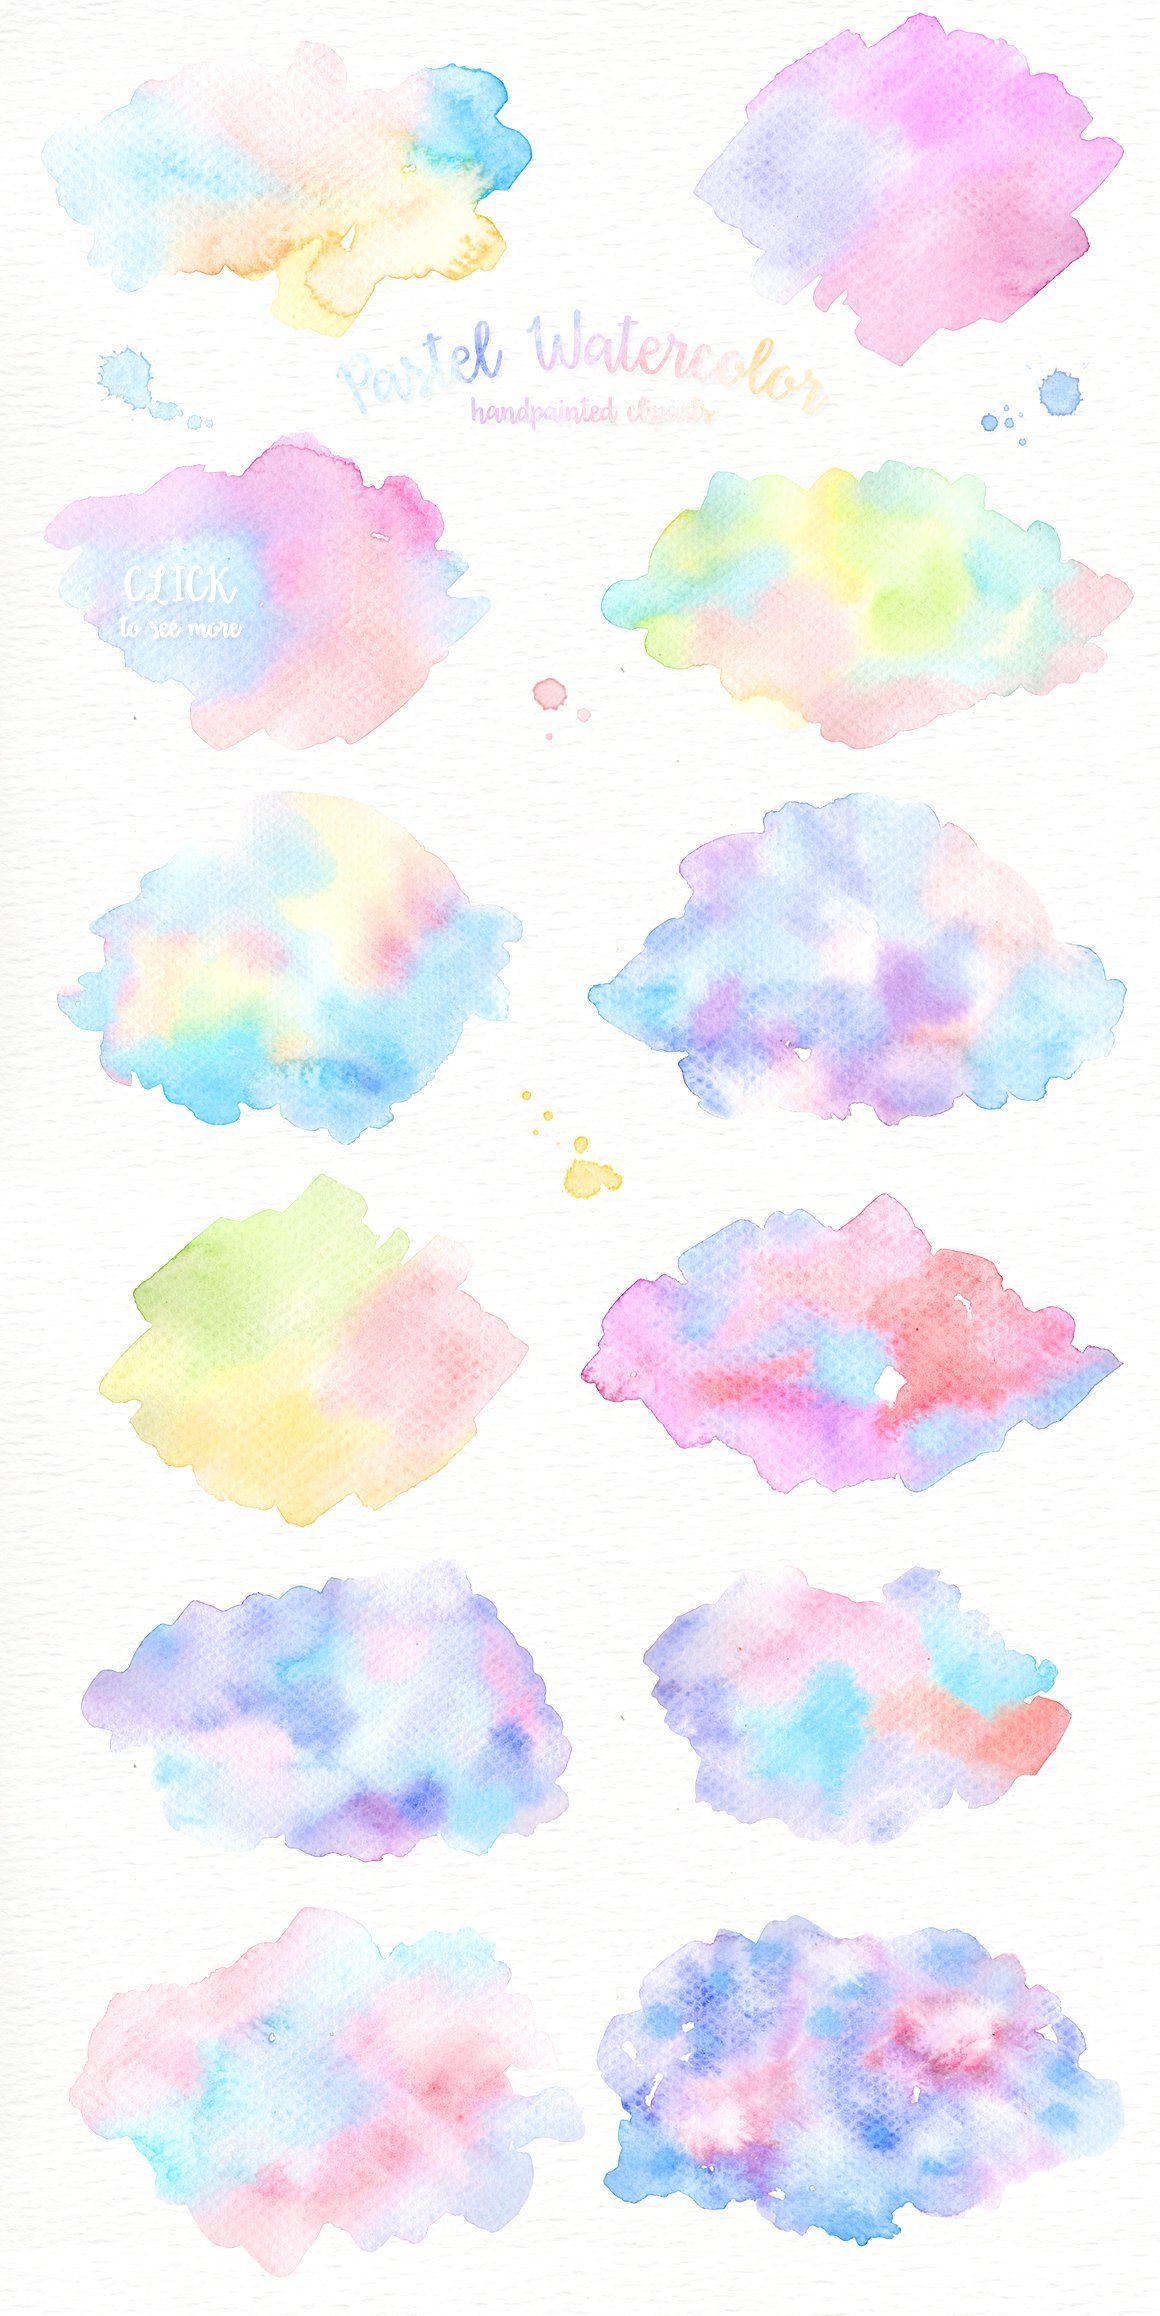 Pastel Watercolor Splashes Clipart ภาพประกอบ ศ ลปะส น ำ เทคน ค